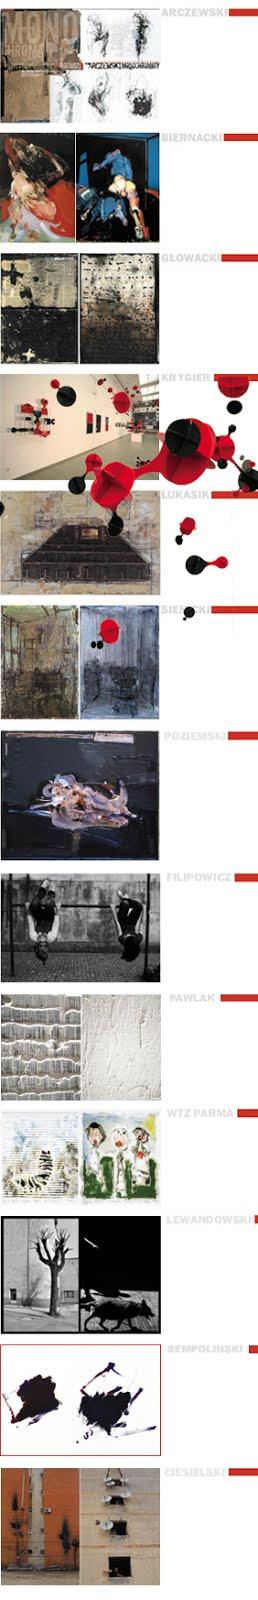 artyści galerii